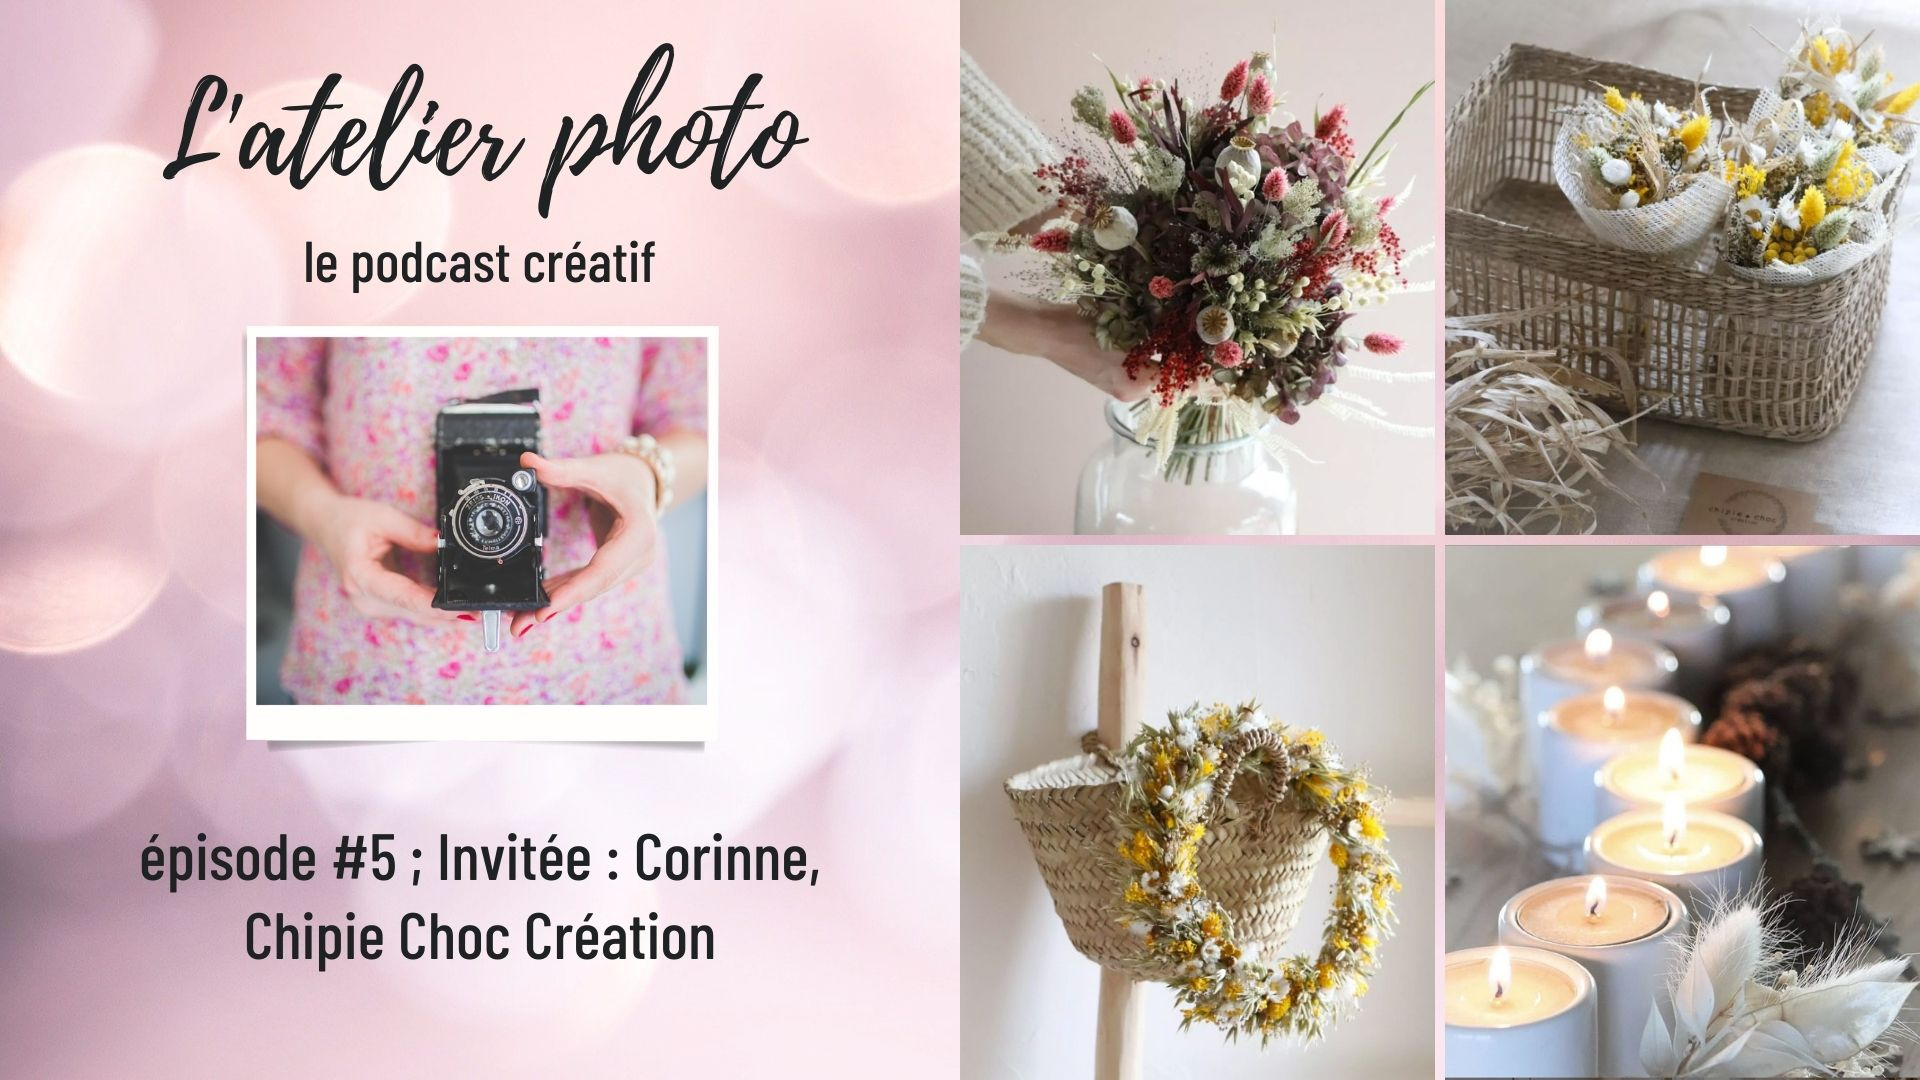 Podcast L'Atelier Photo - Invitée Corinne, Chipie Choc Création